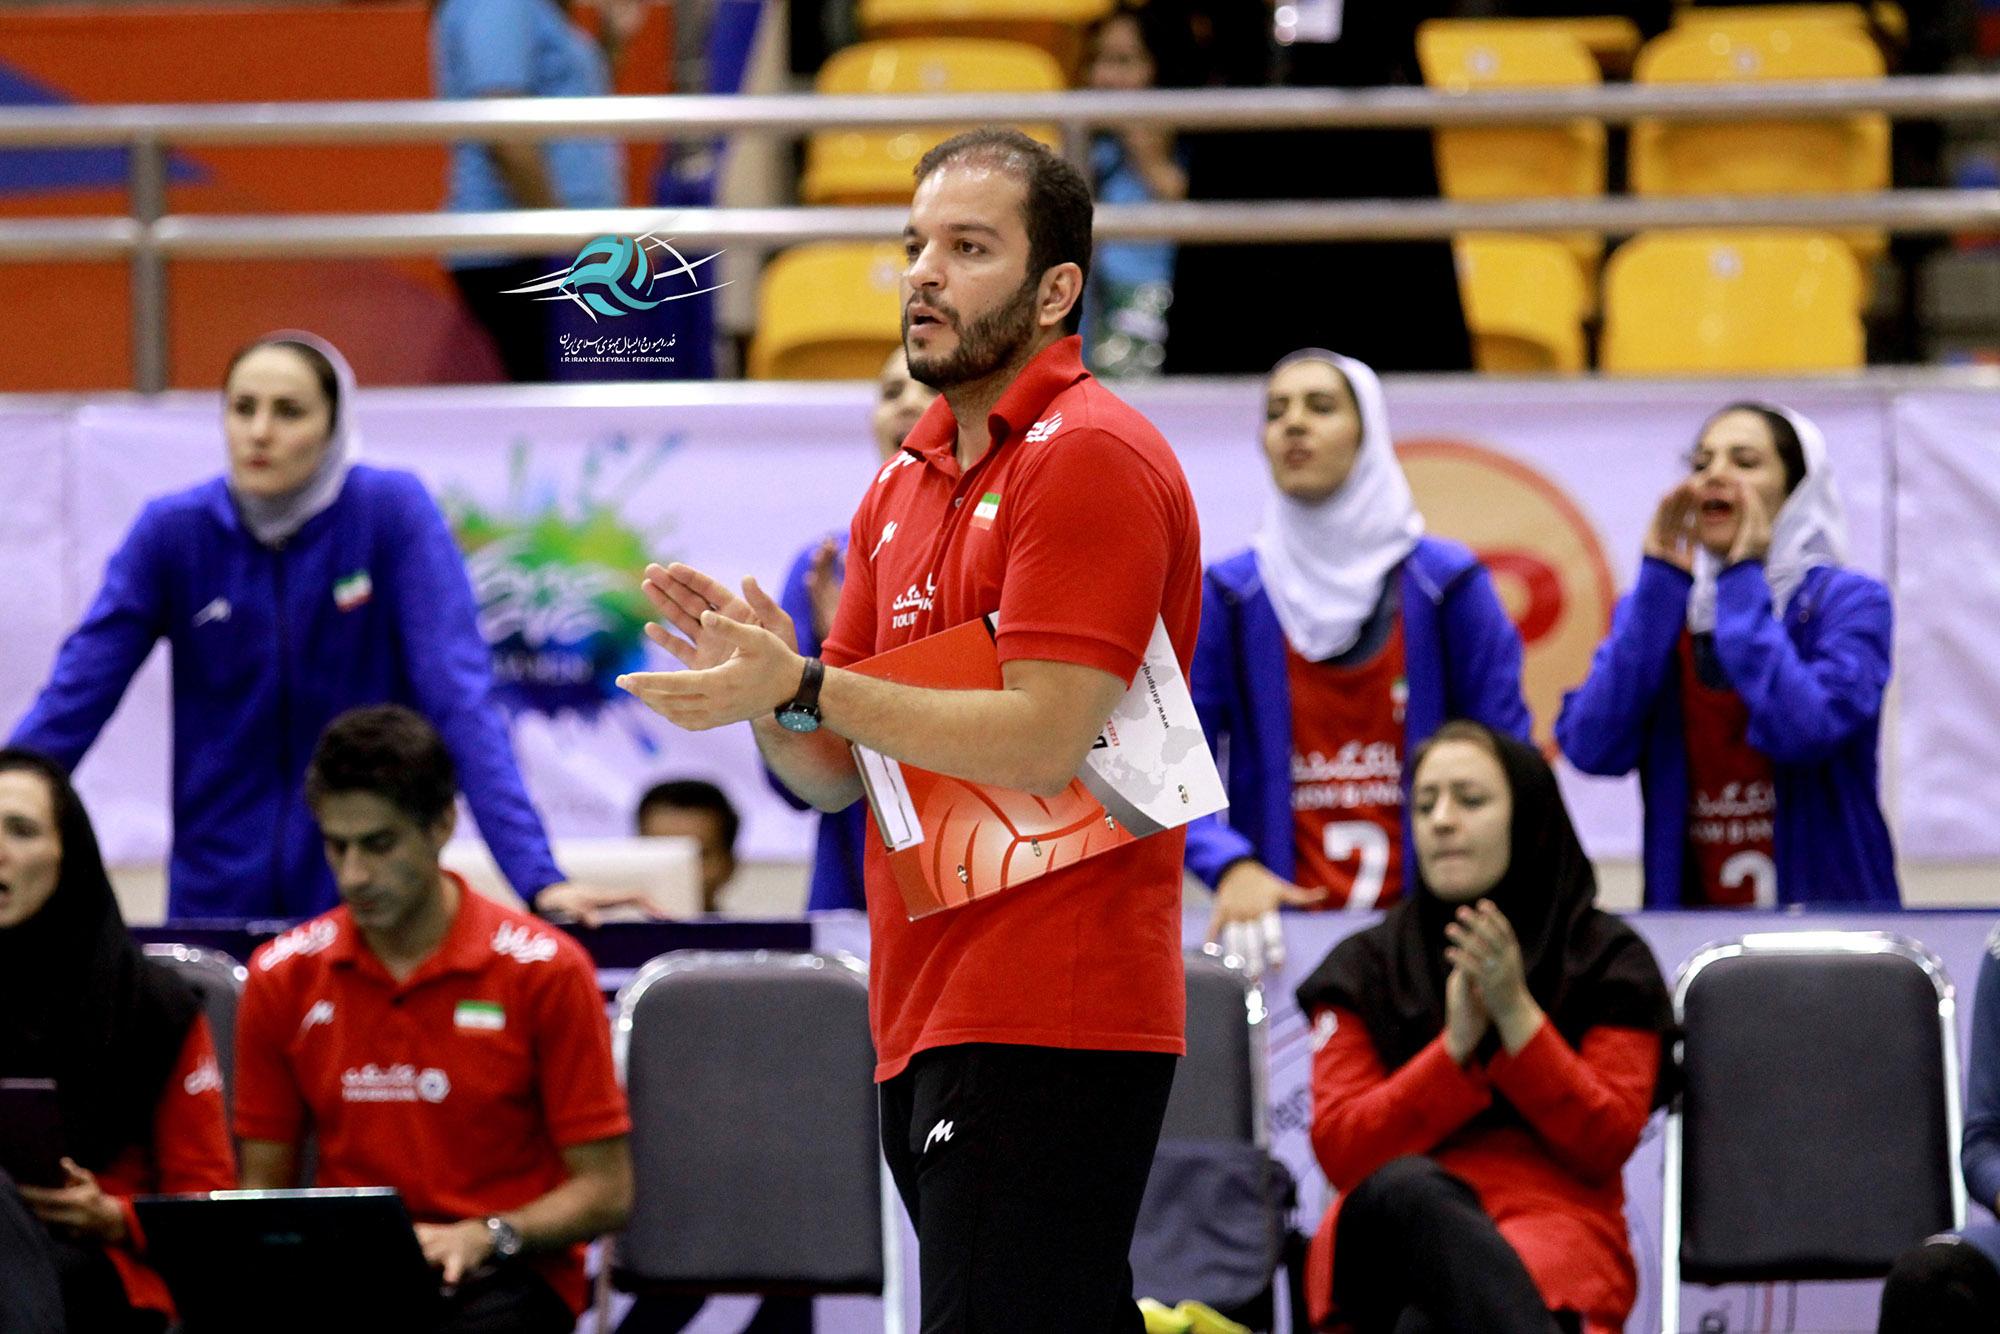 IRN PHL 6 سرمربی تیم ملی والیبال سرمربی العربی شد | خداحافظی مهرگان با تیم ملی؟